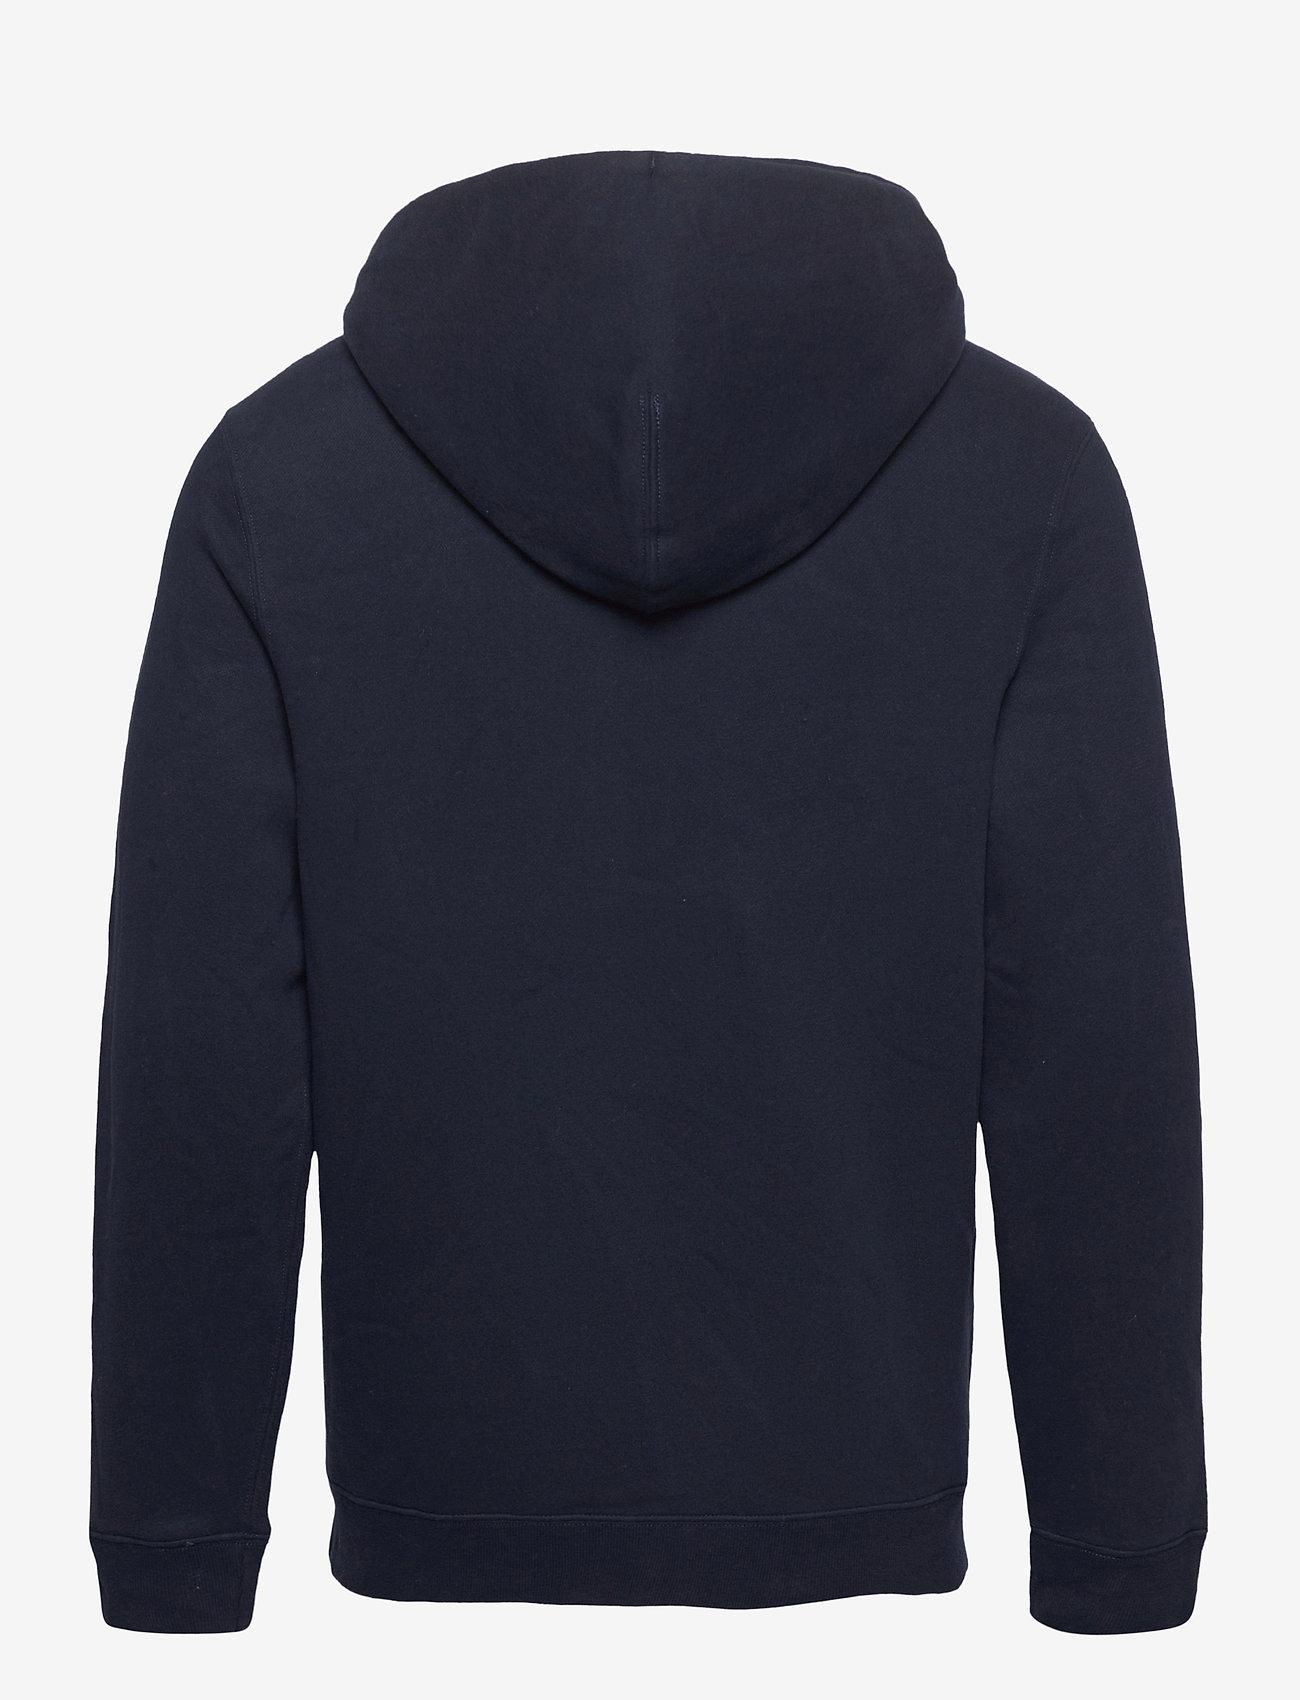 Abercrombie & Fitch ANF MENS SWEATSHIRTS - Sweatshirts NAVY DD - Menn Klær